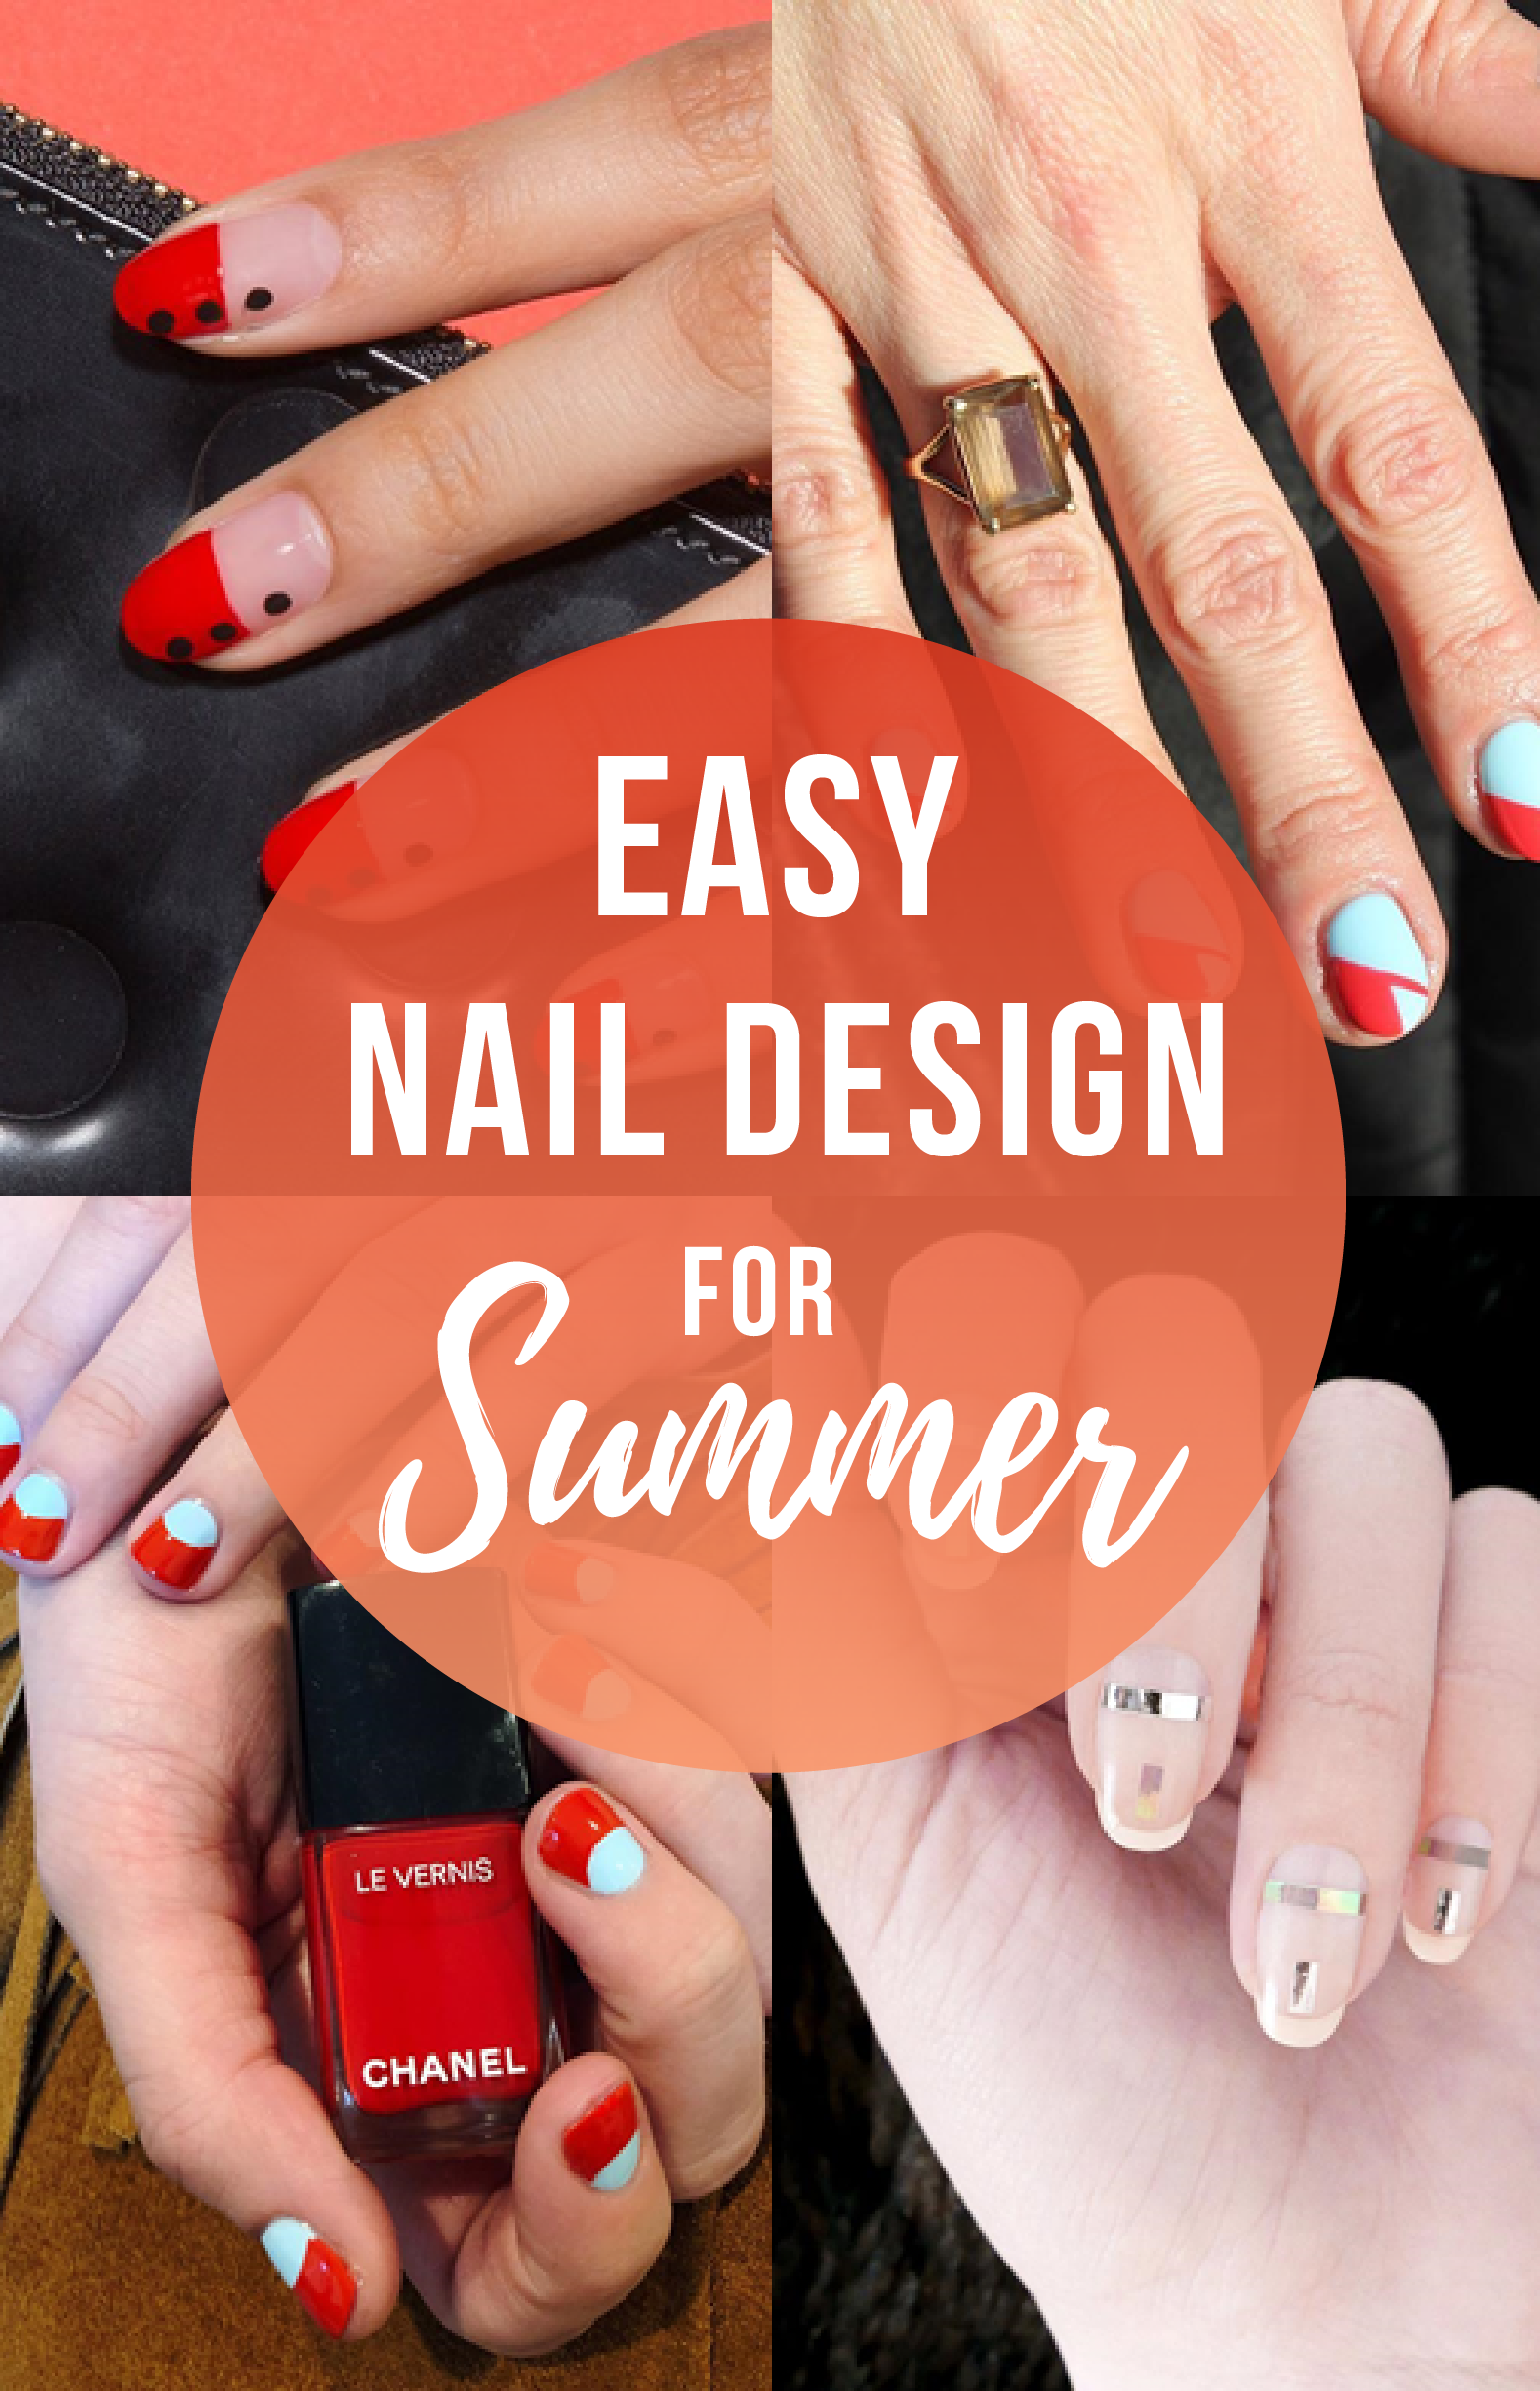 easy nail design ideas be fashionabl blog pinterest